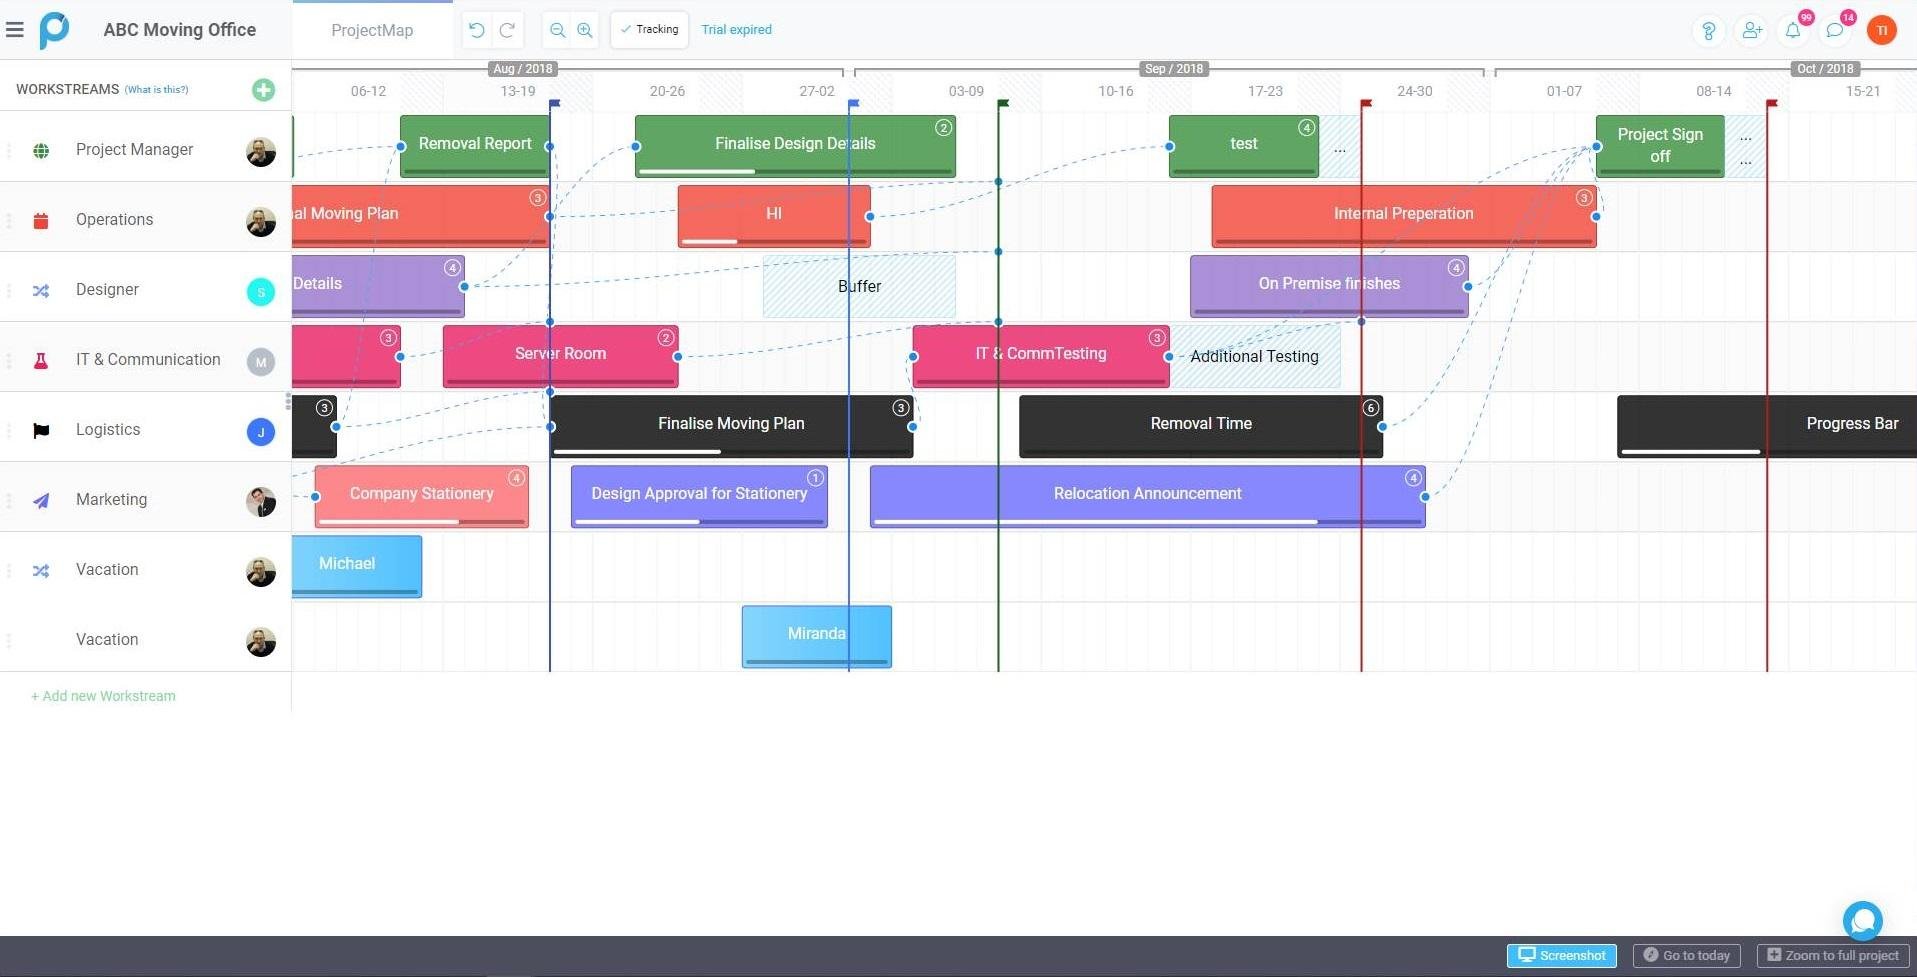 Etapes gestion de projet planification Proggio